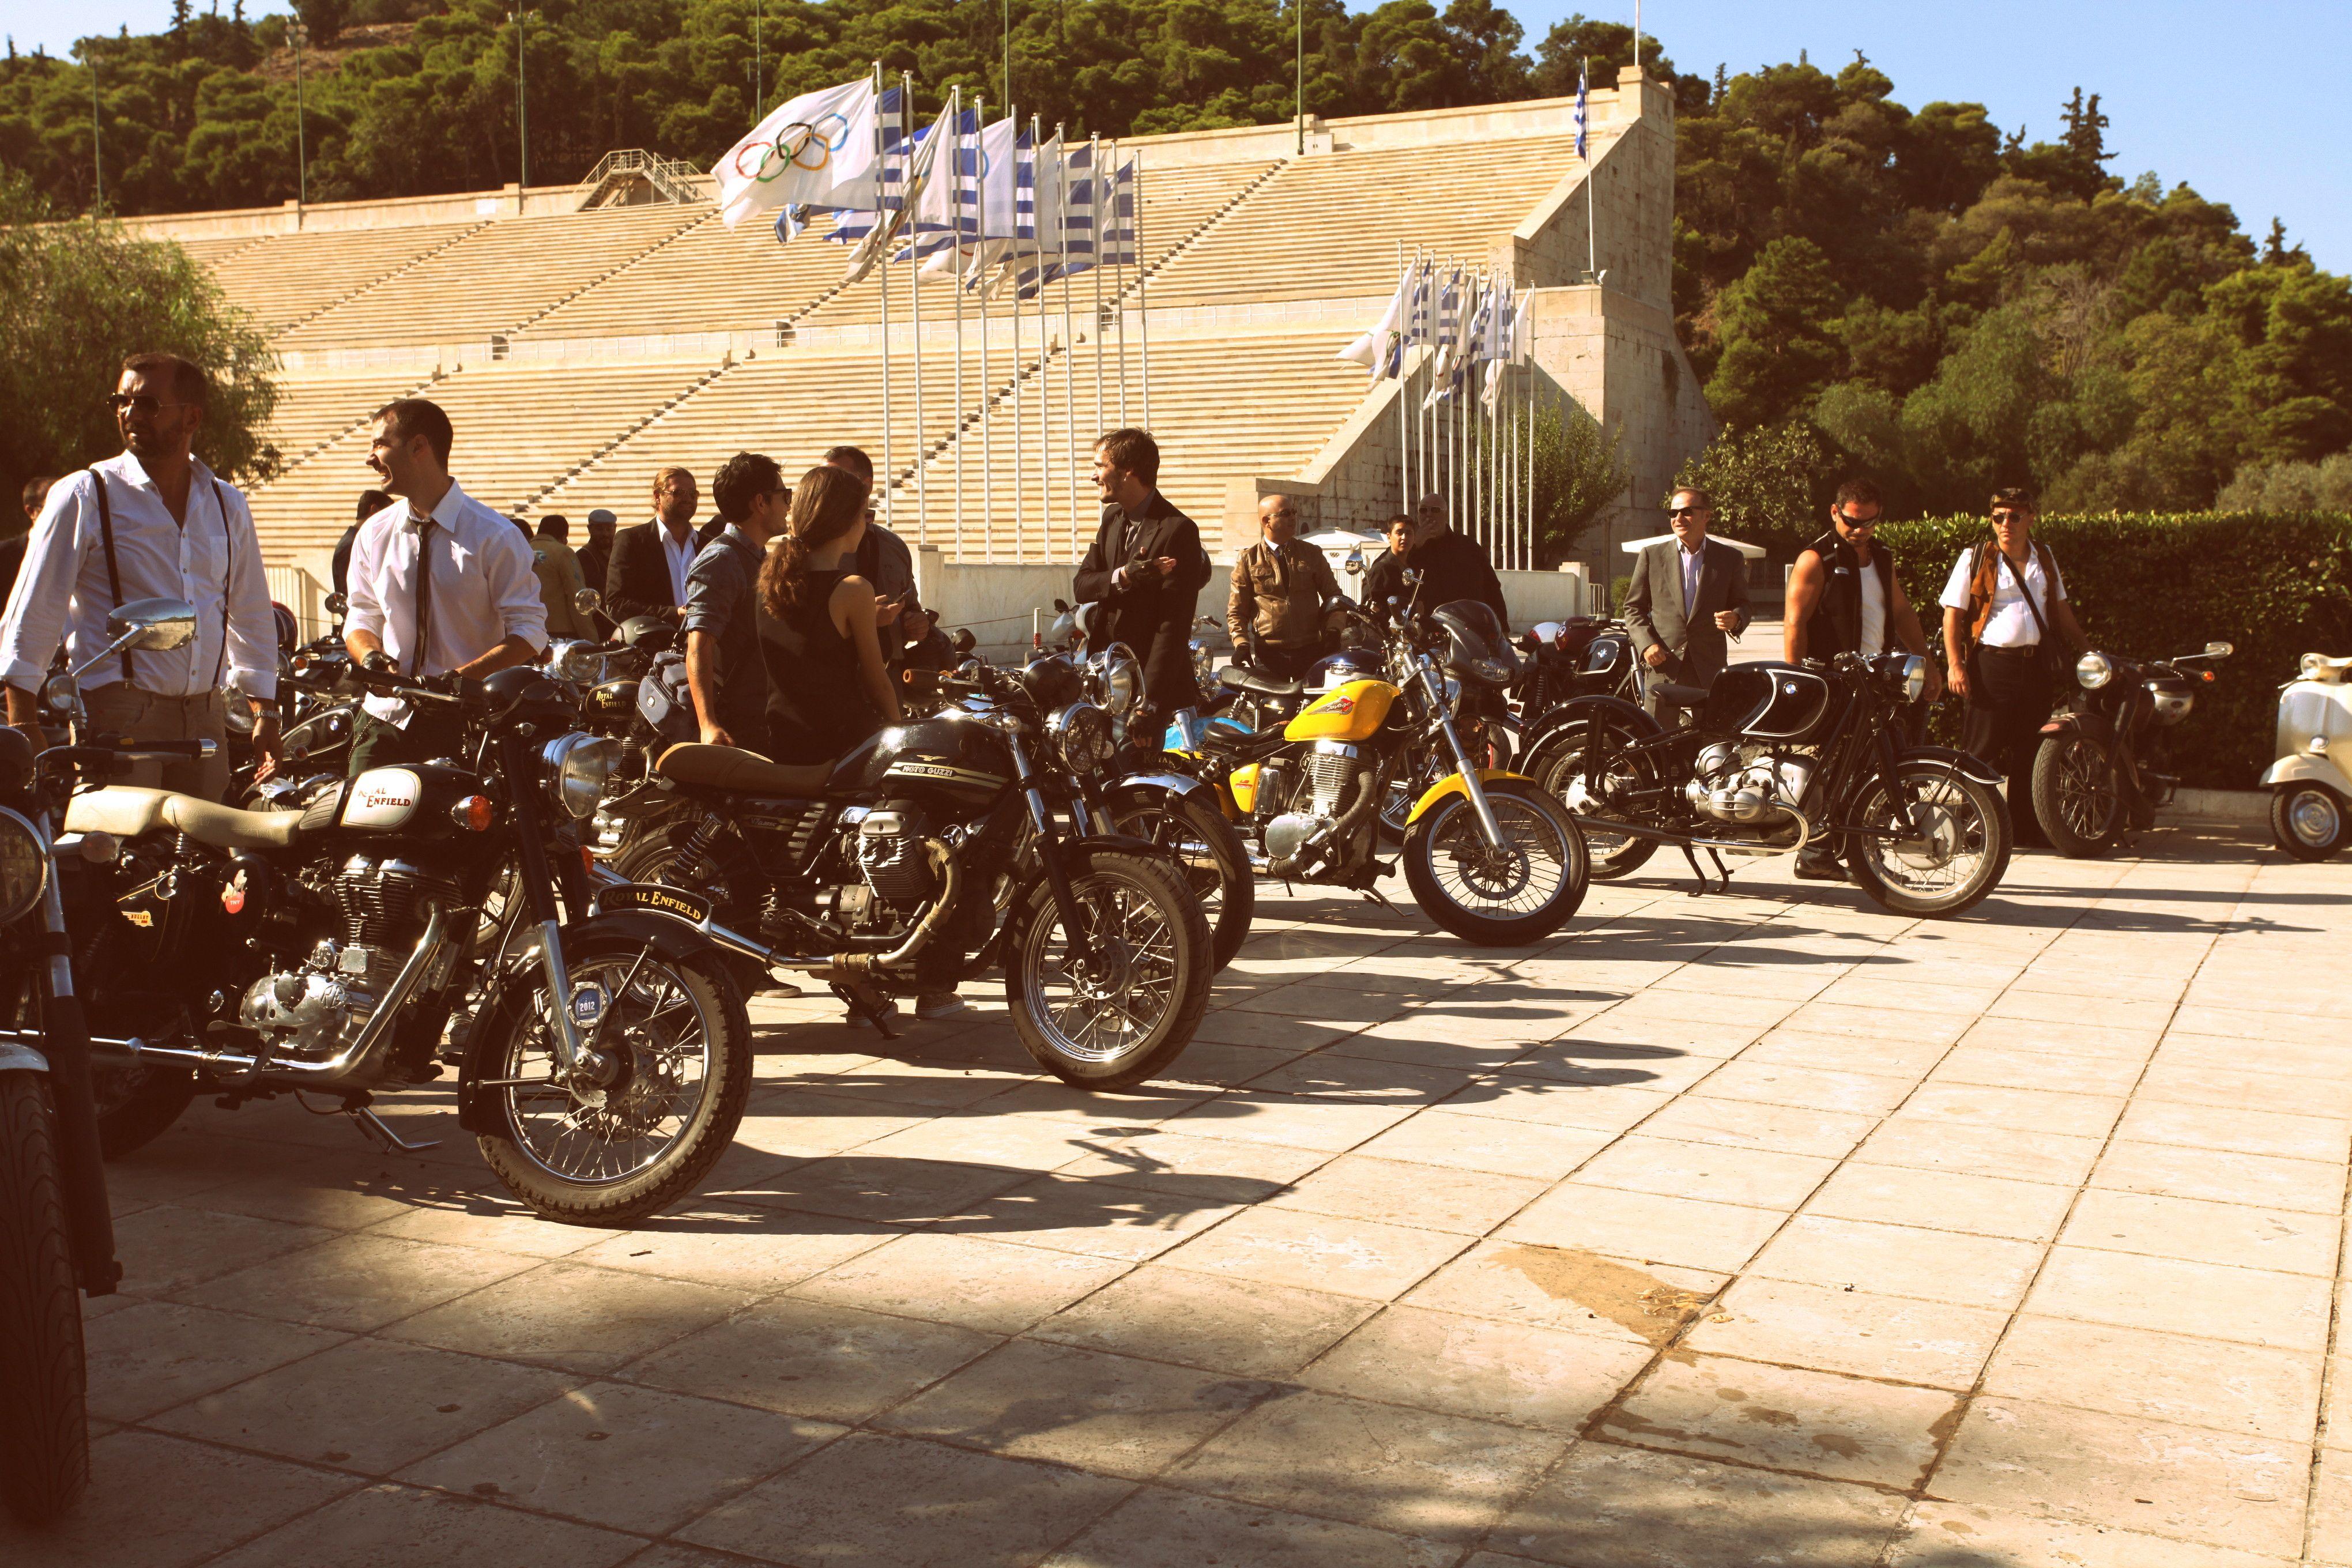 Athens dgr 2013 athens riding vehicles